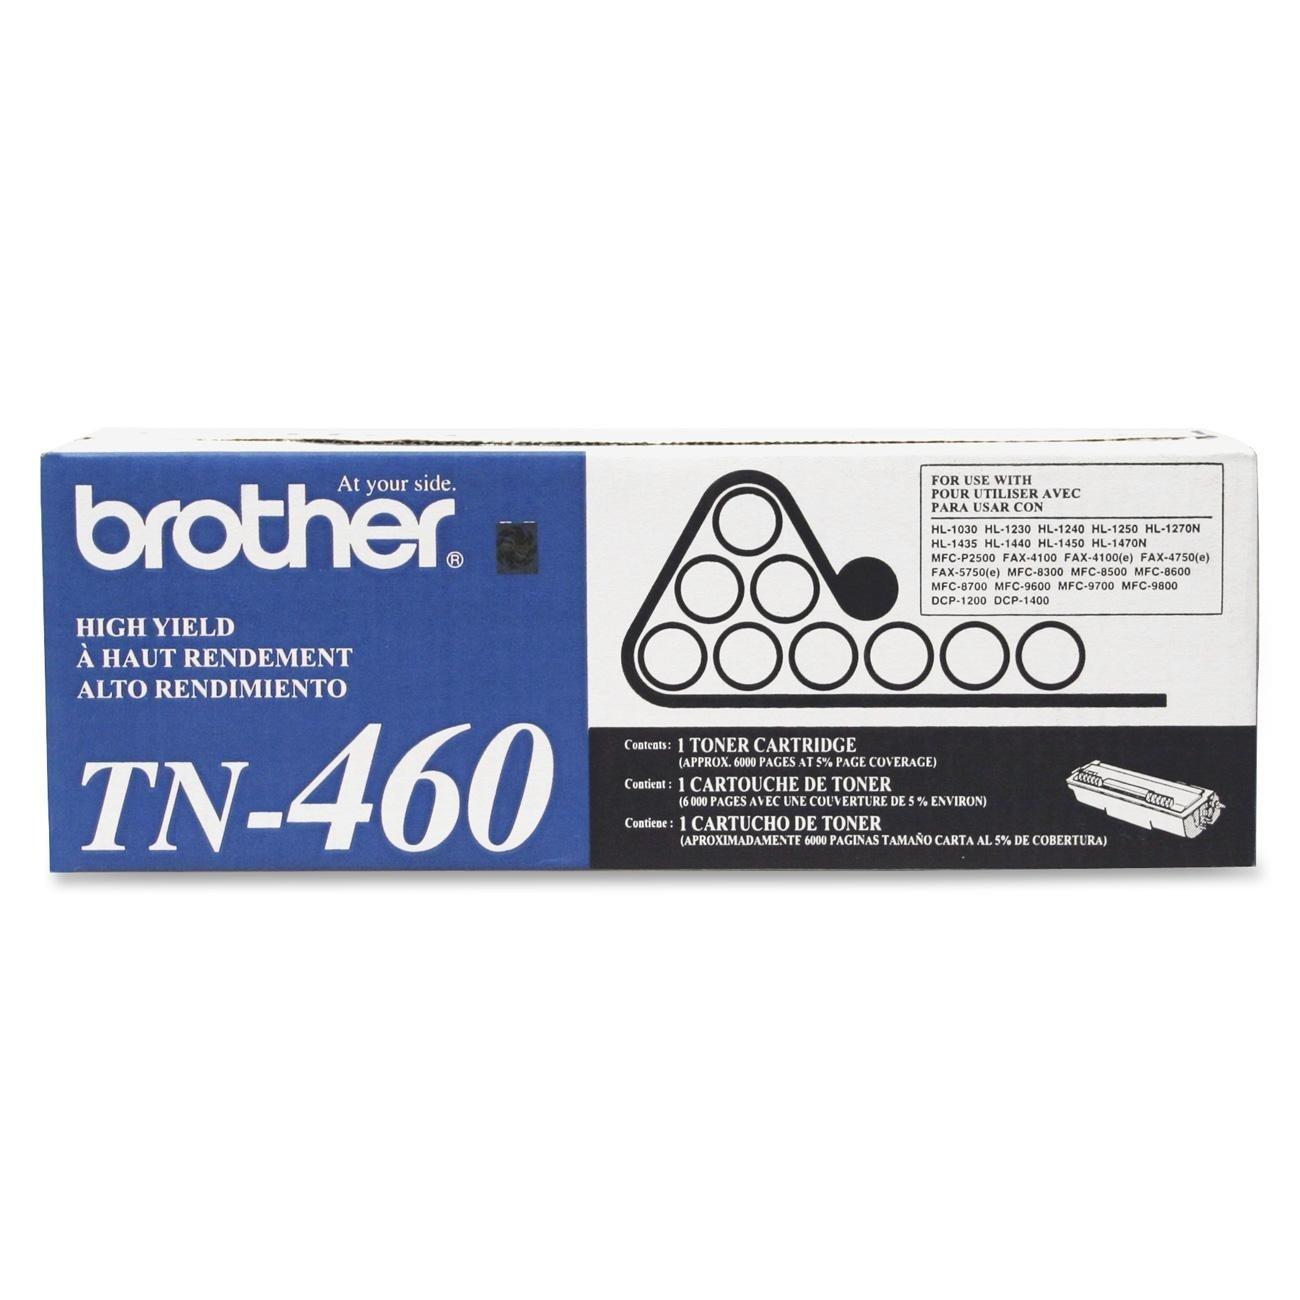 Toner Original BROTHER TN-460 (TN460) Alta Capacidad Black Laser 2-Pack